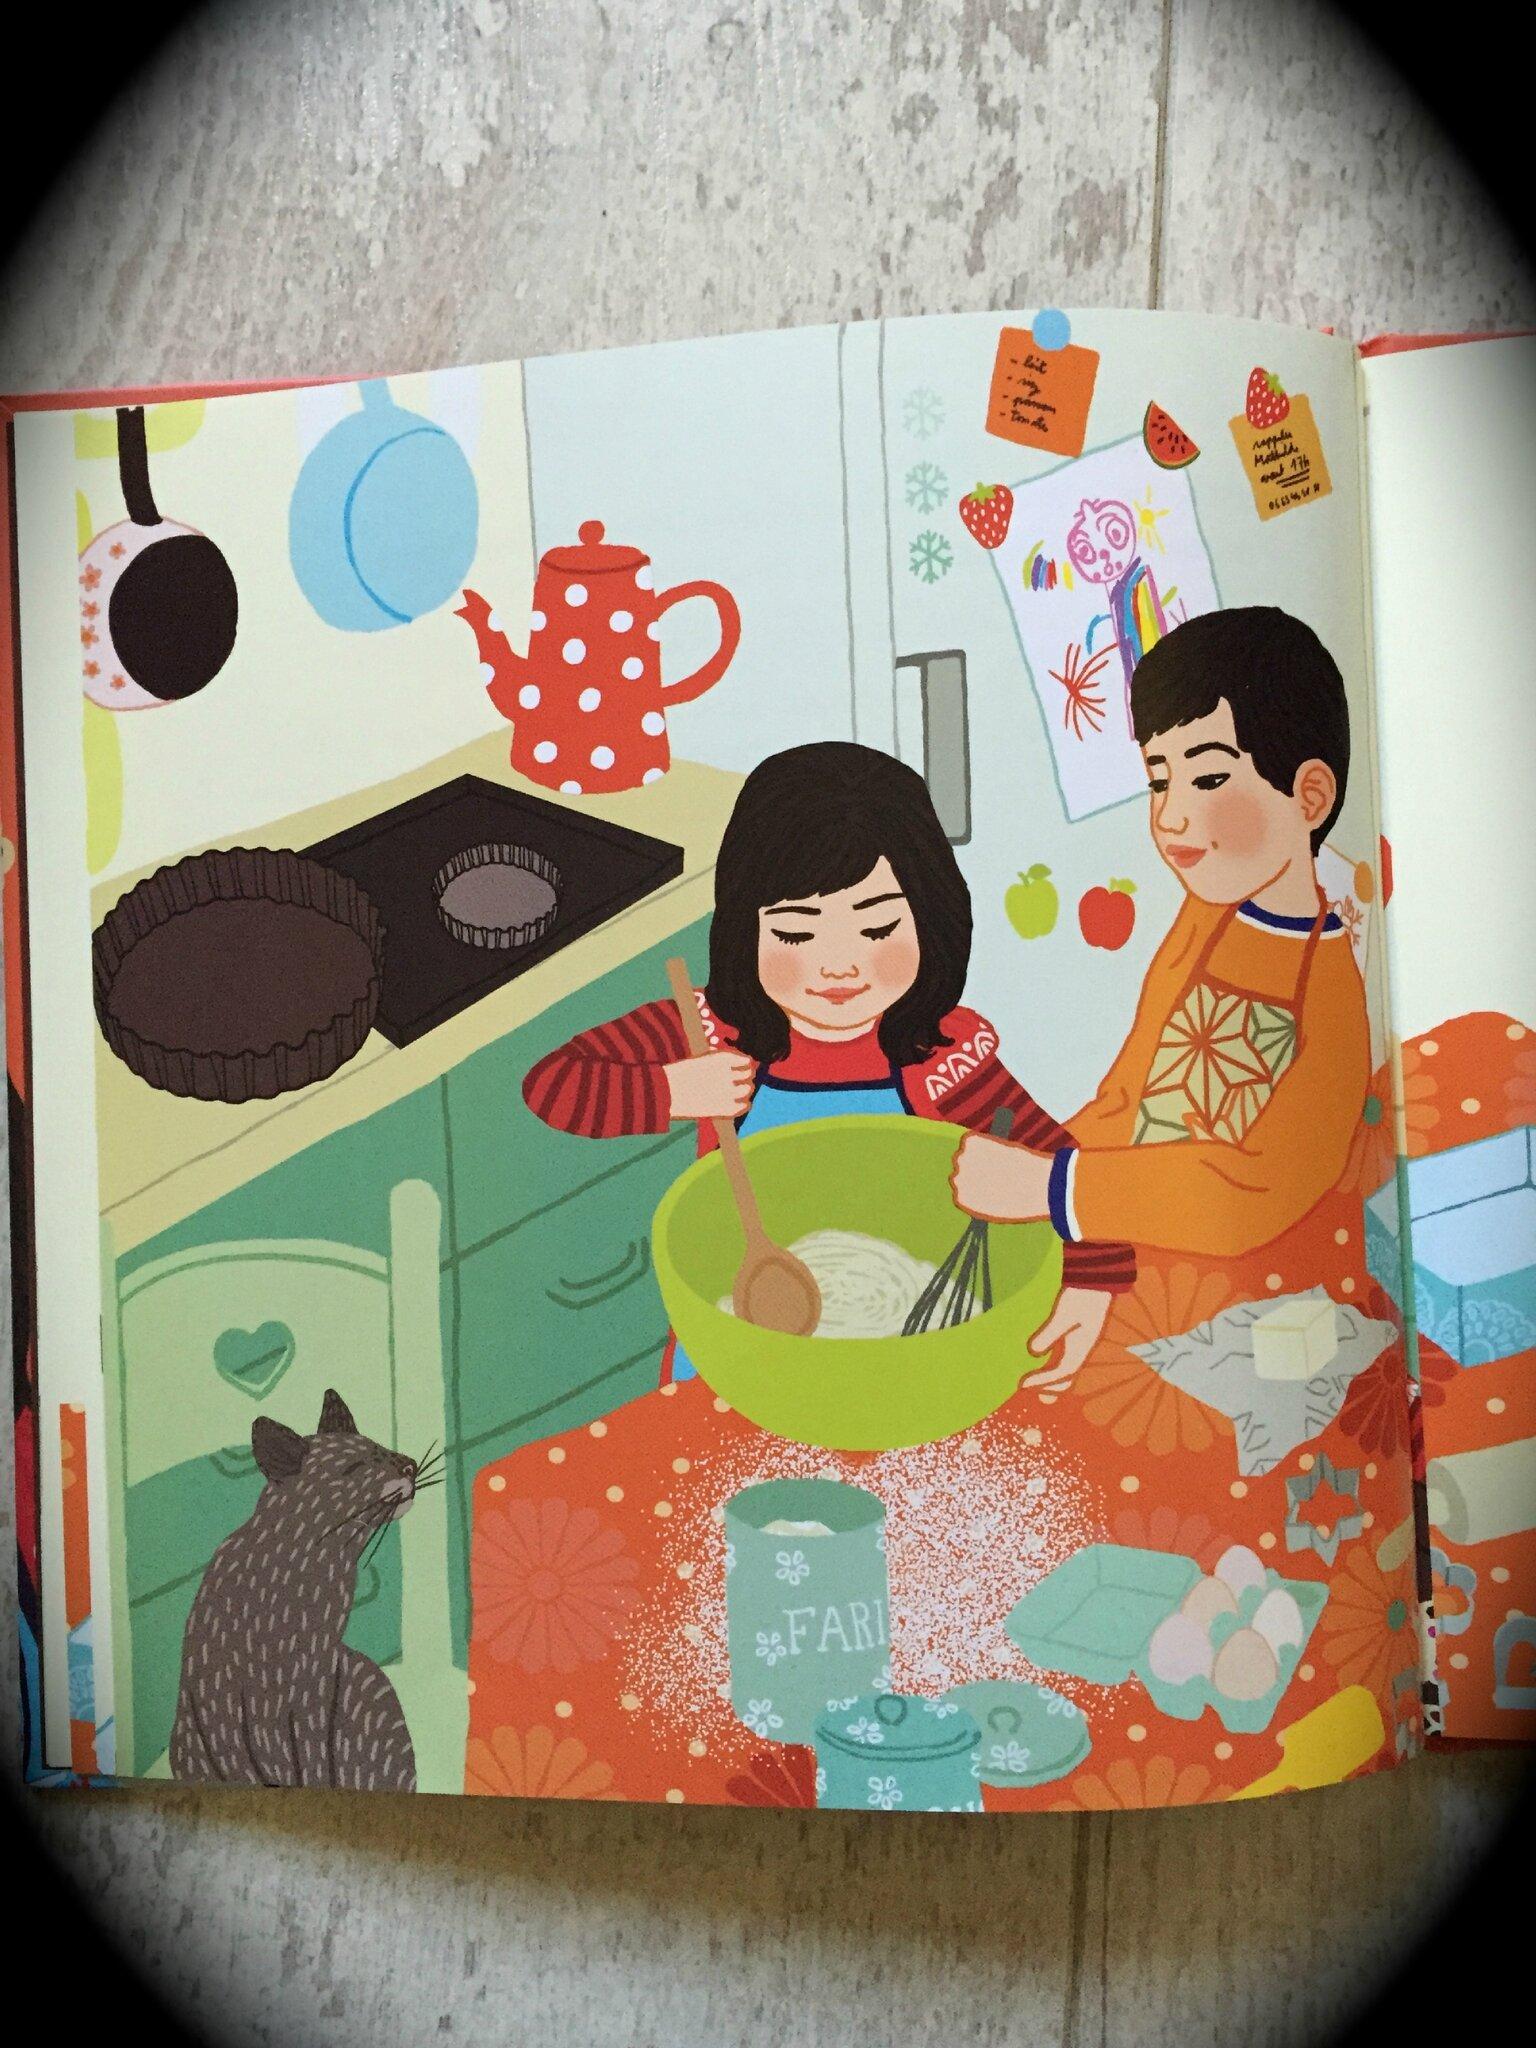 Bulle Et Bob Dans La Cuisine : bulle, cuisine, Bulle, Cuisine., Trois, Livre